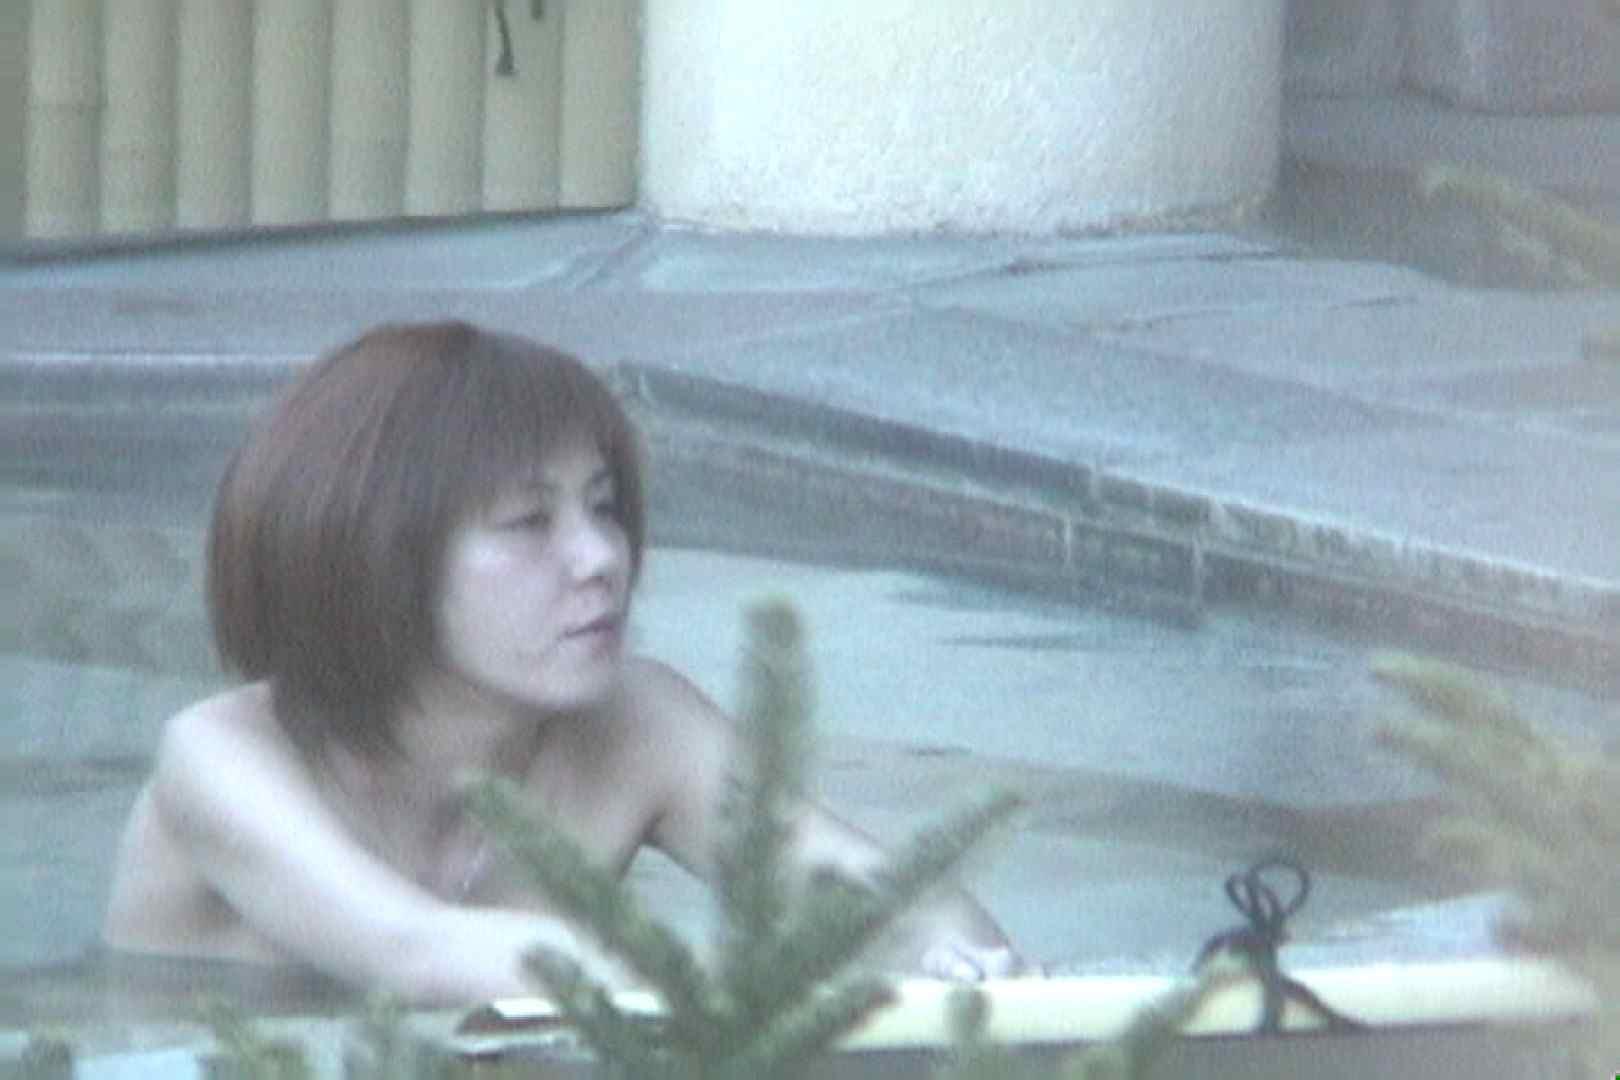 Aquaな露天風呂Vol.560 露天 | HなOL  62pic 25